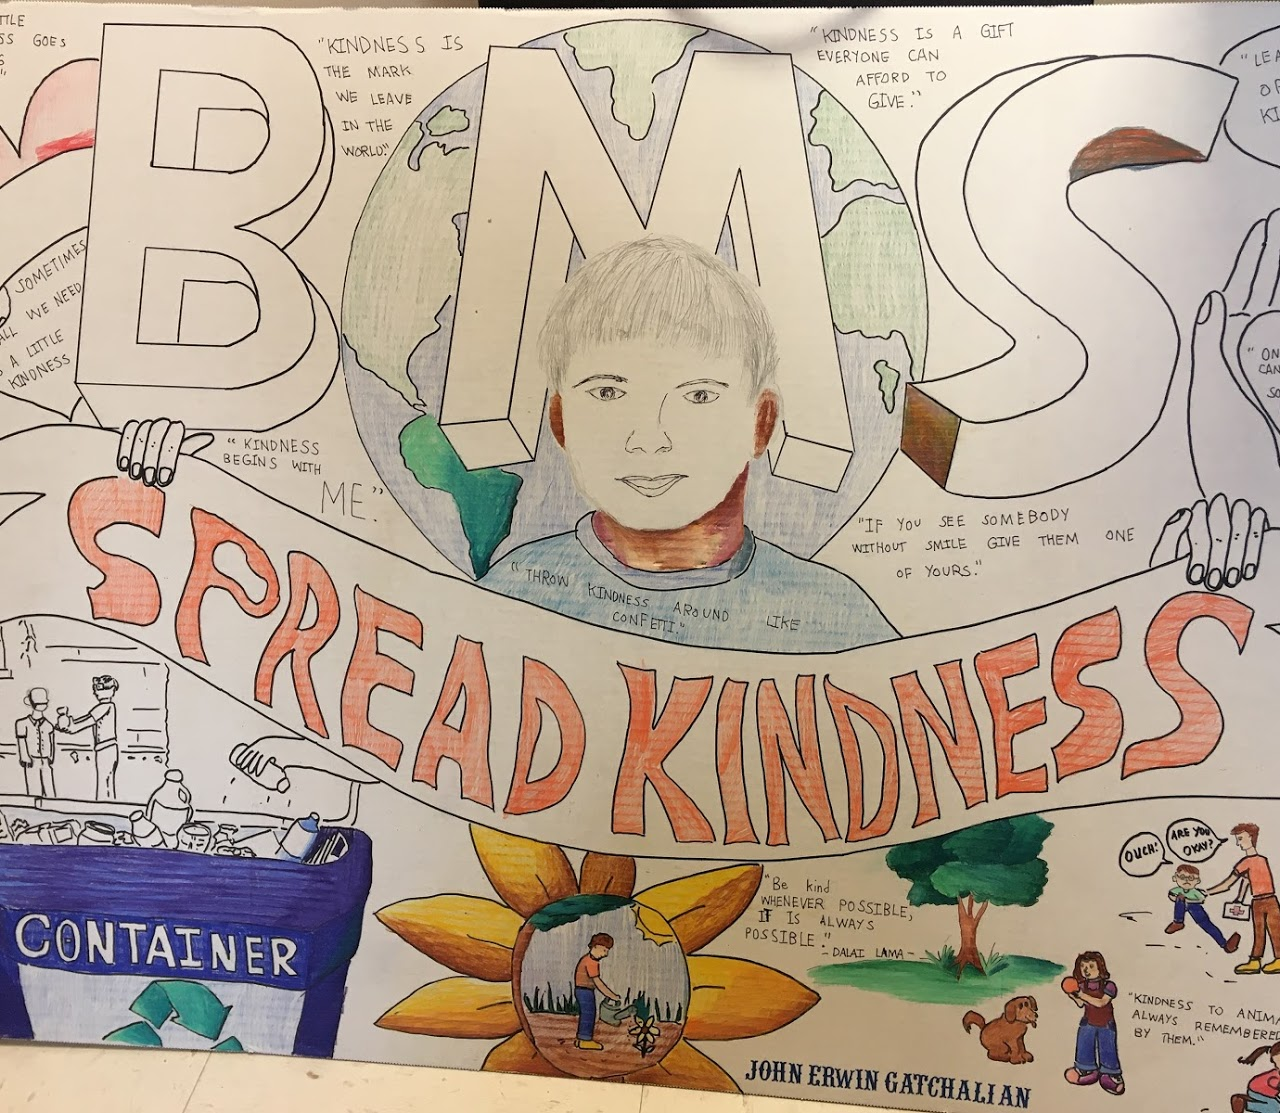 Spread Kindness Mural